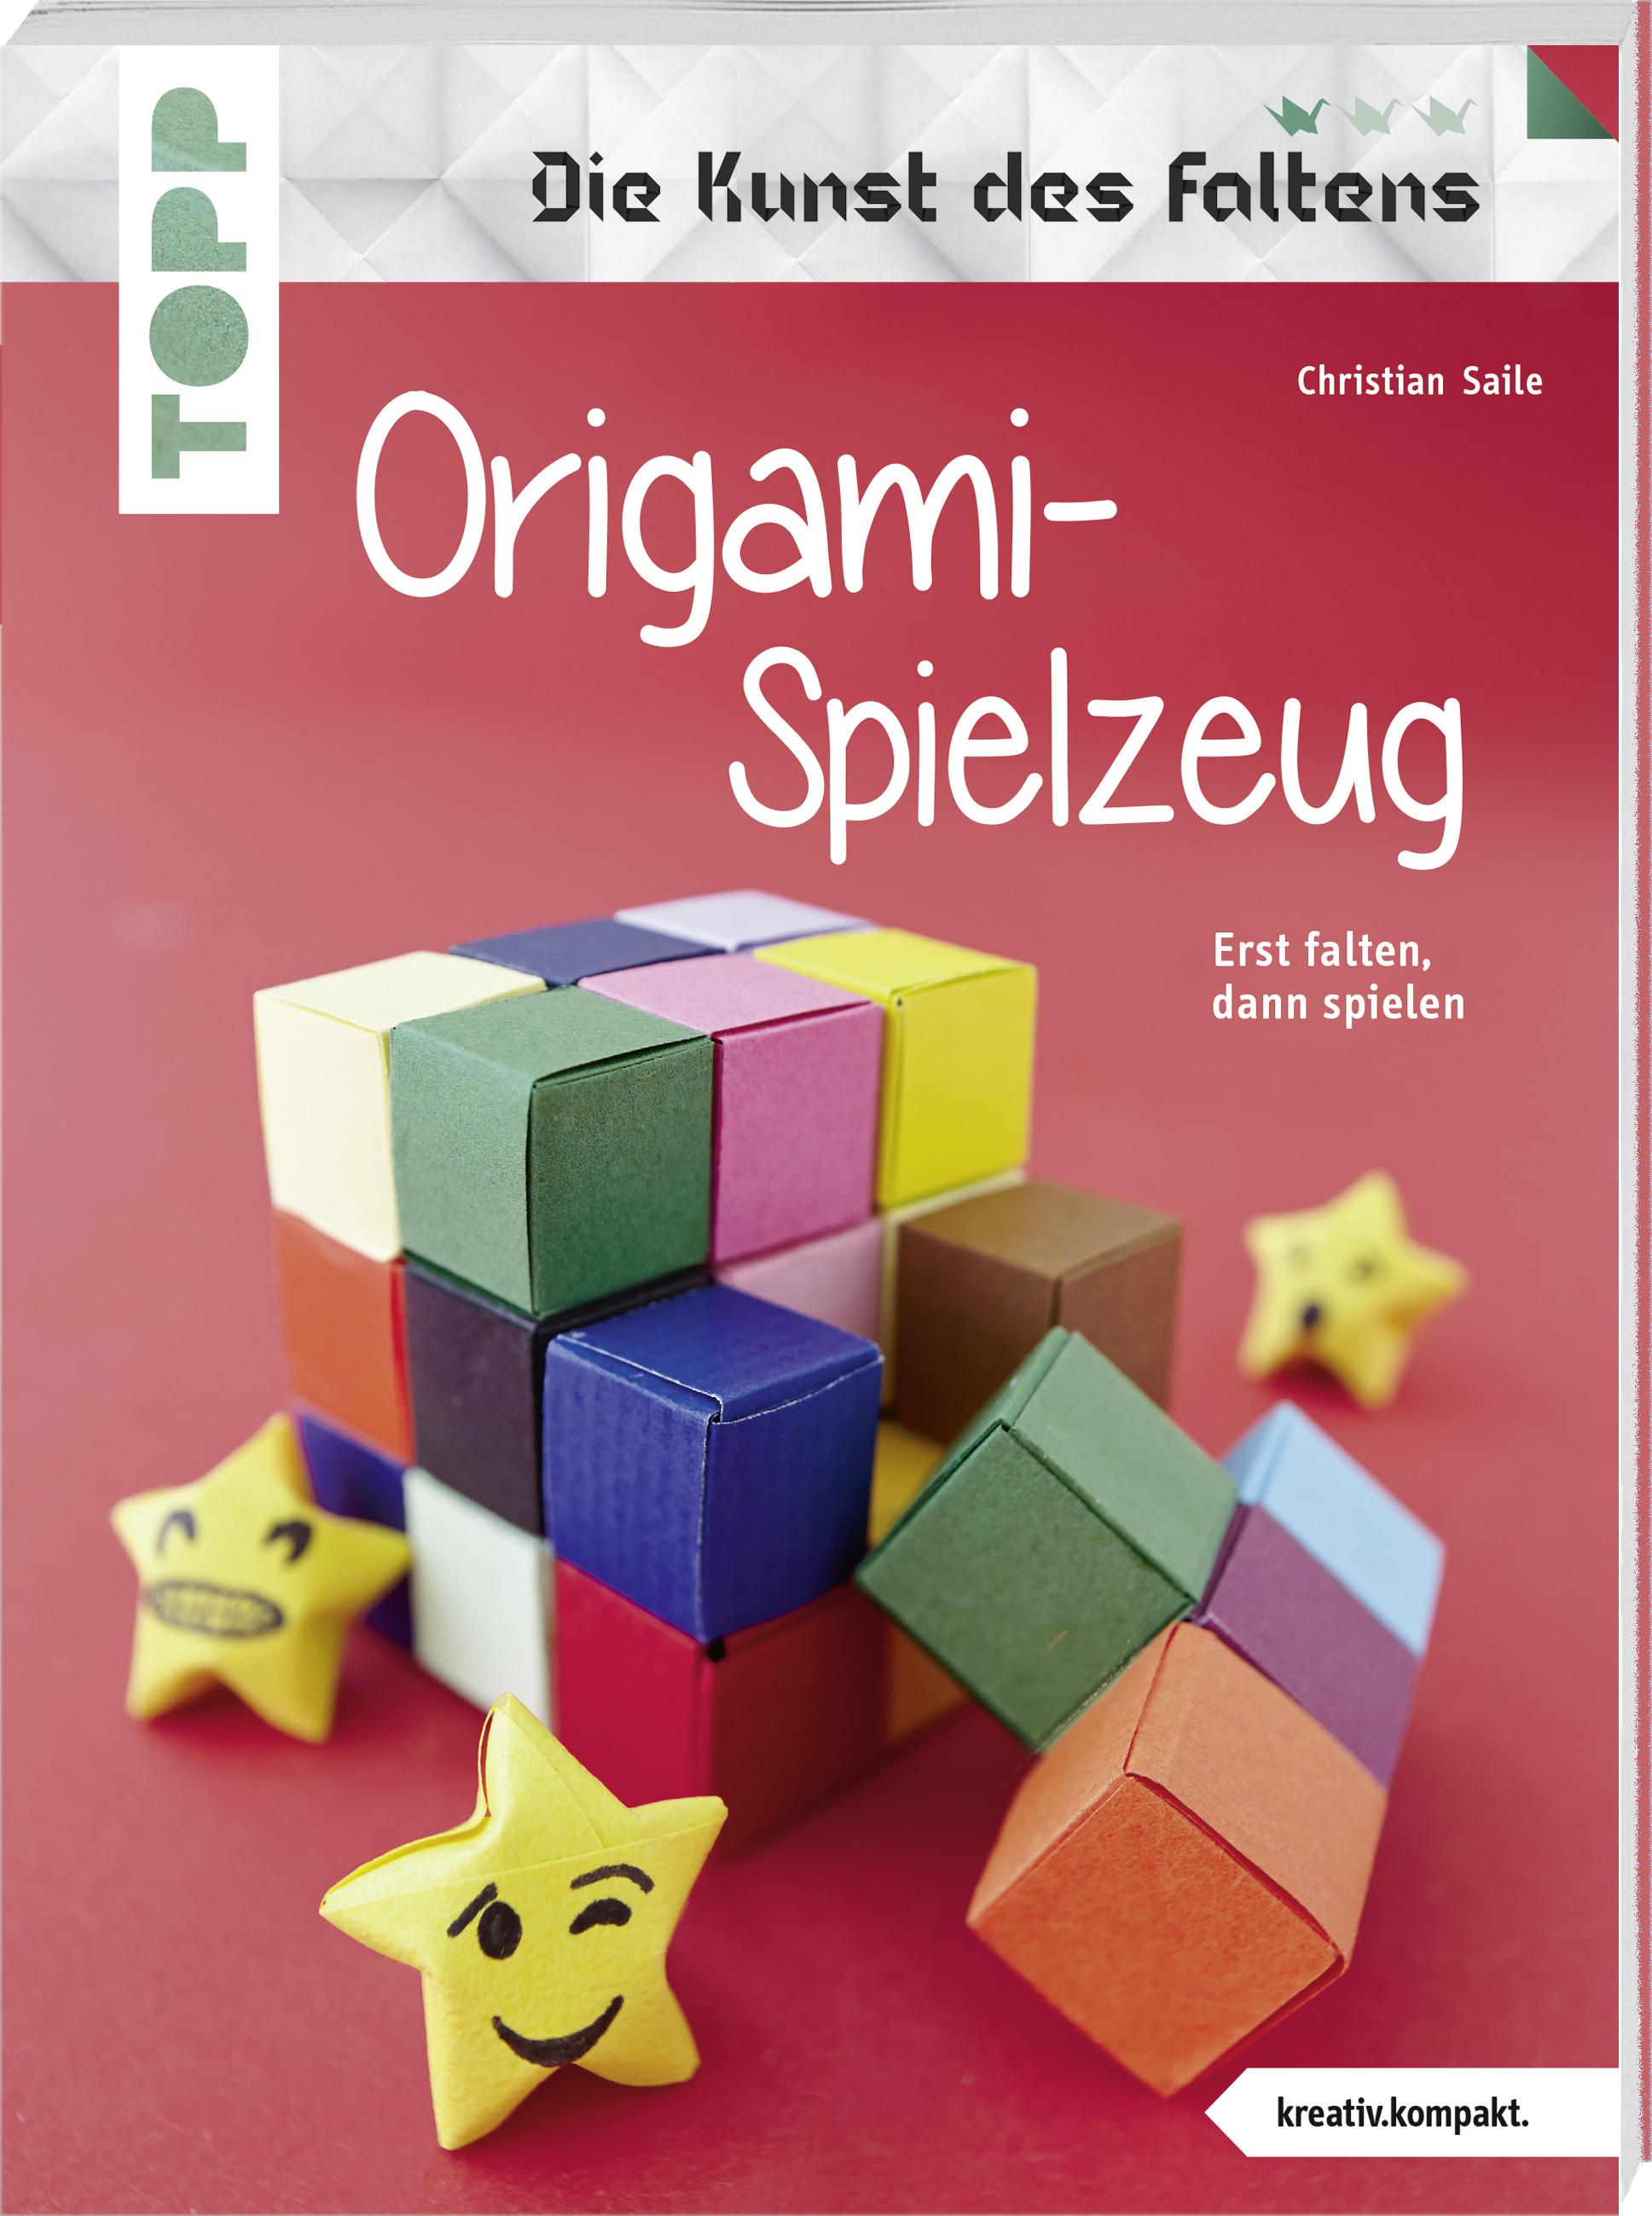 Origami Spielzeug Die Kunst Des Faltens Kreativ Kompakt